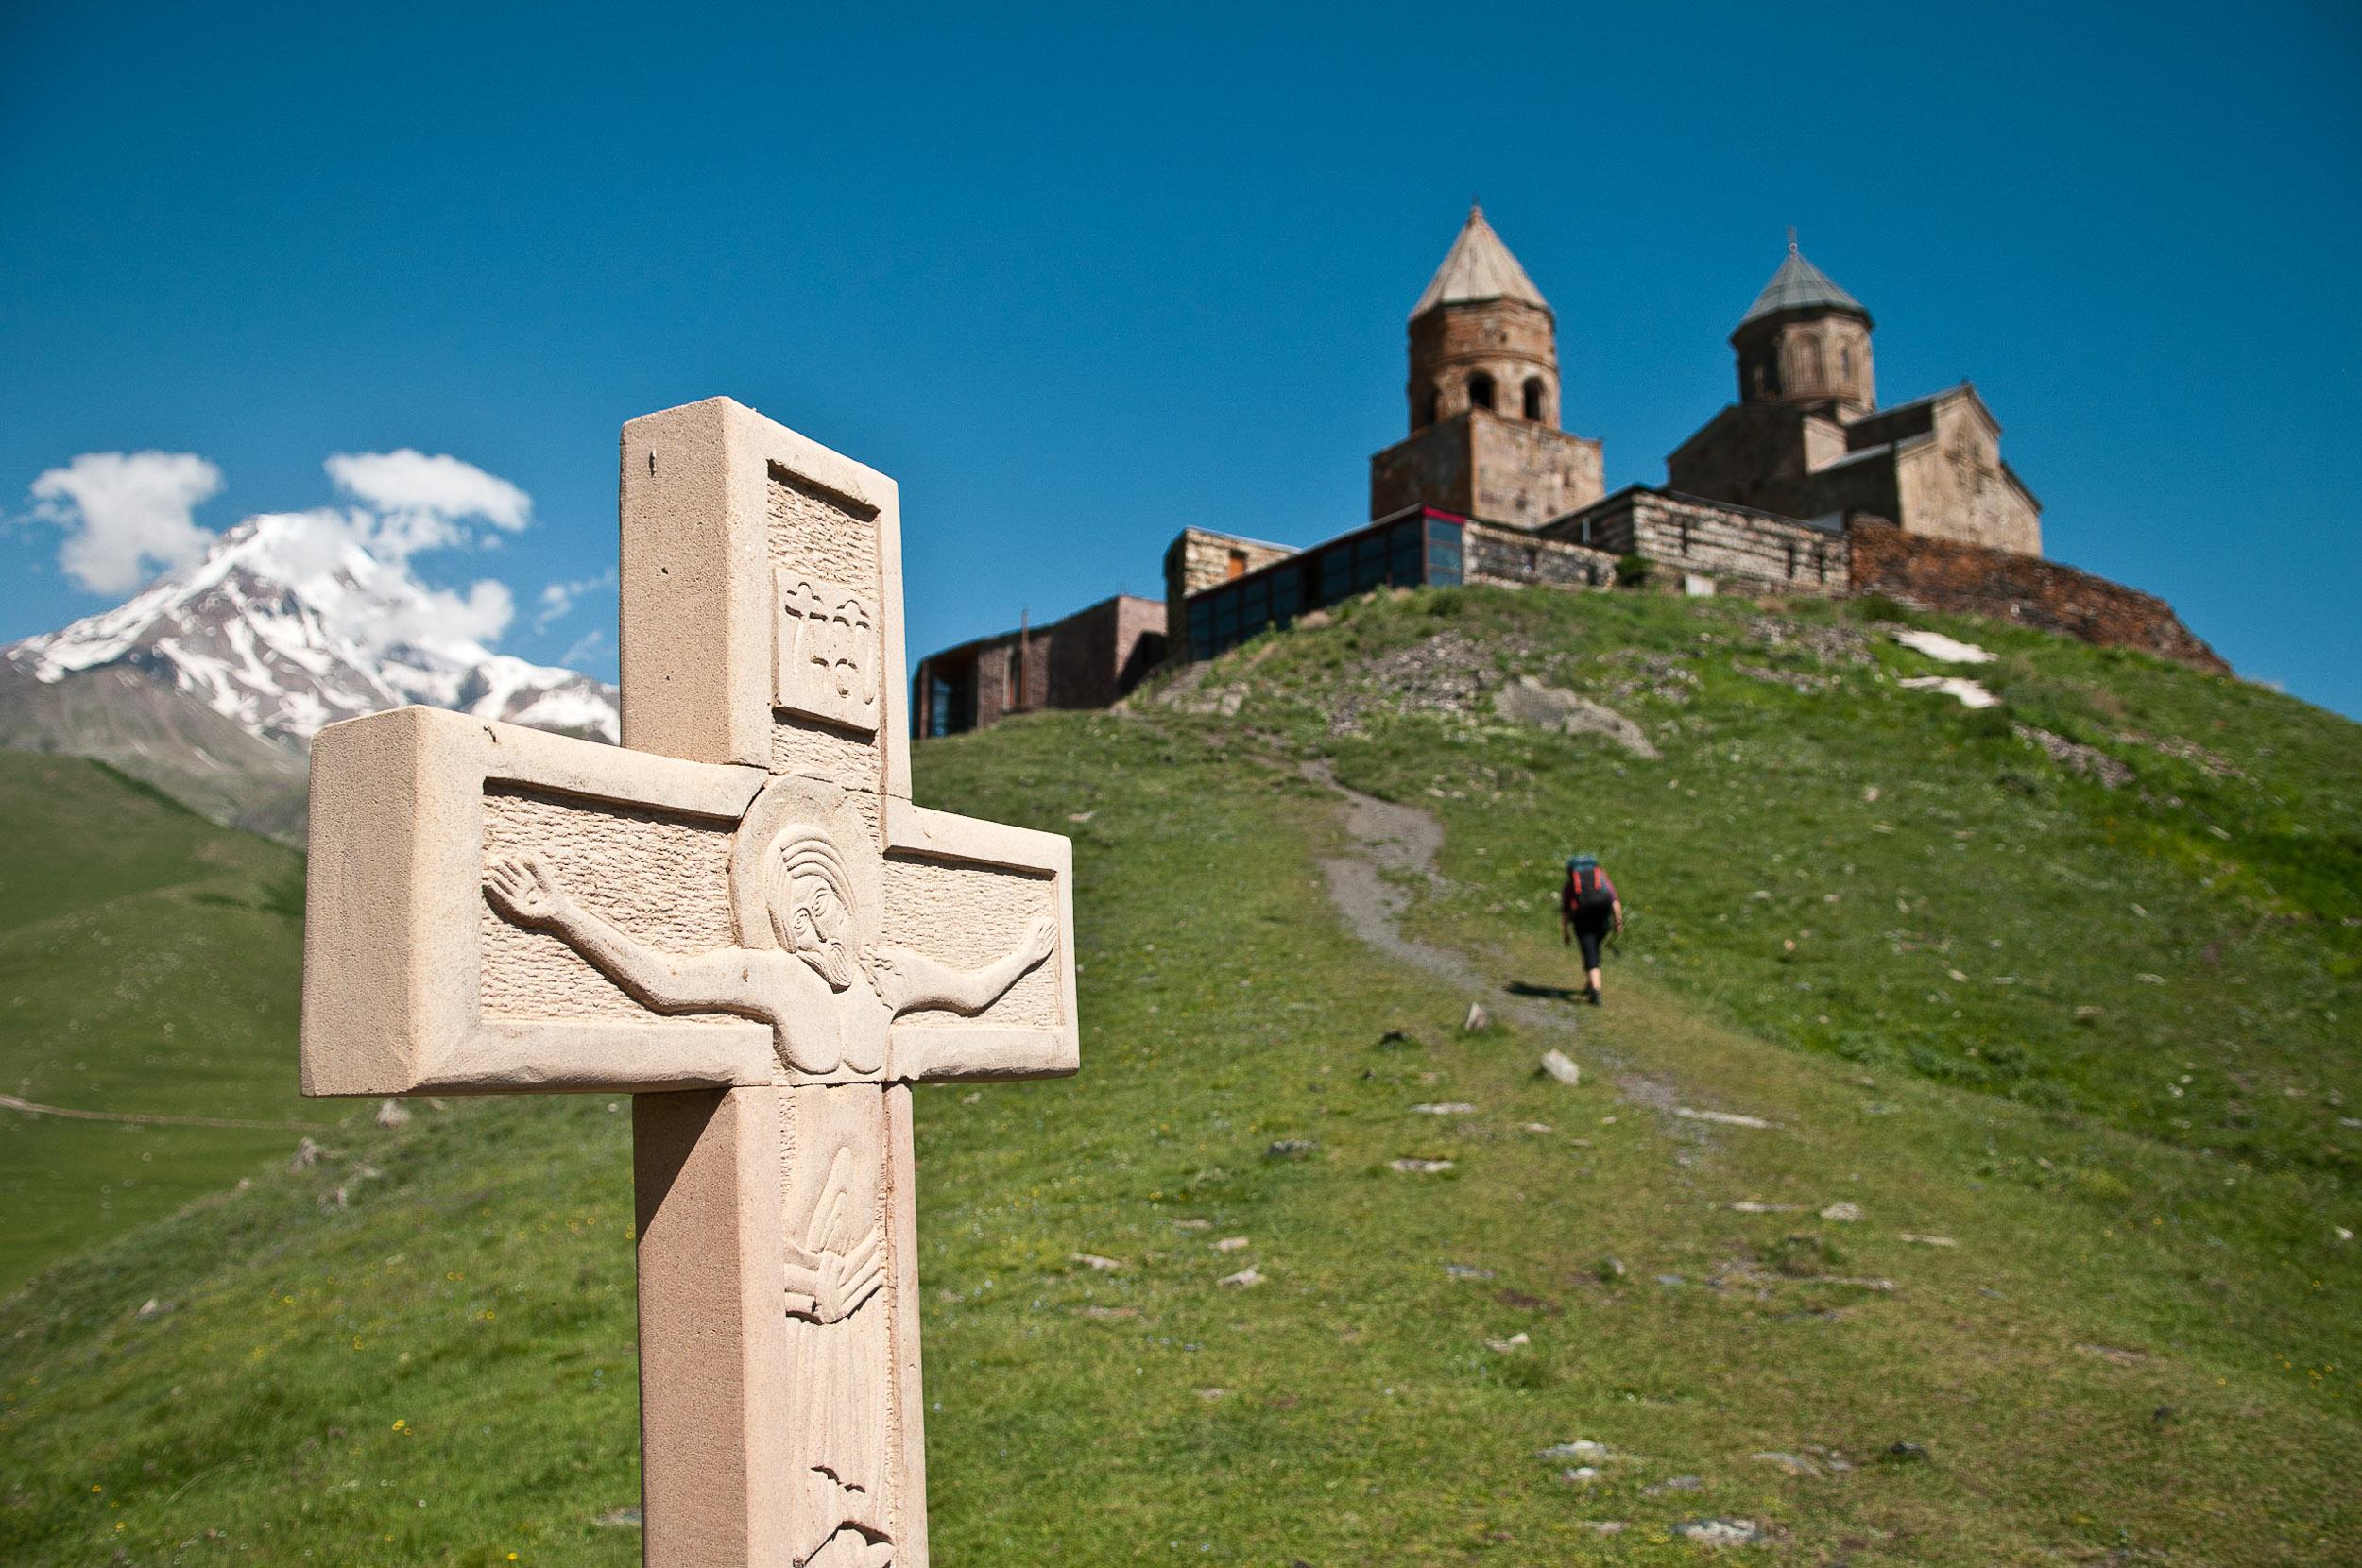 Cross and church above Kazbegi village, Georgia